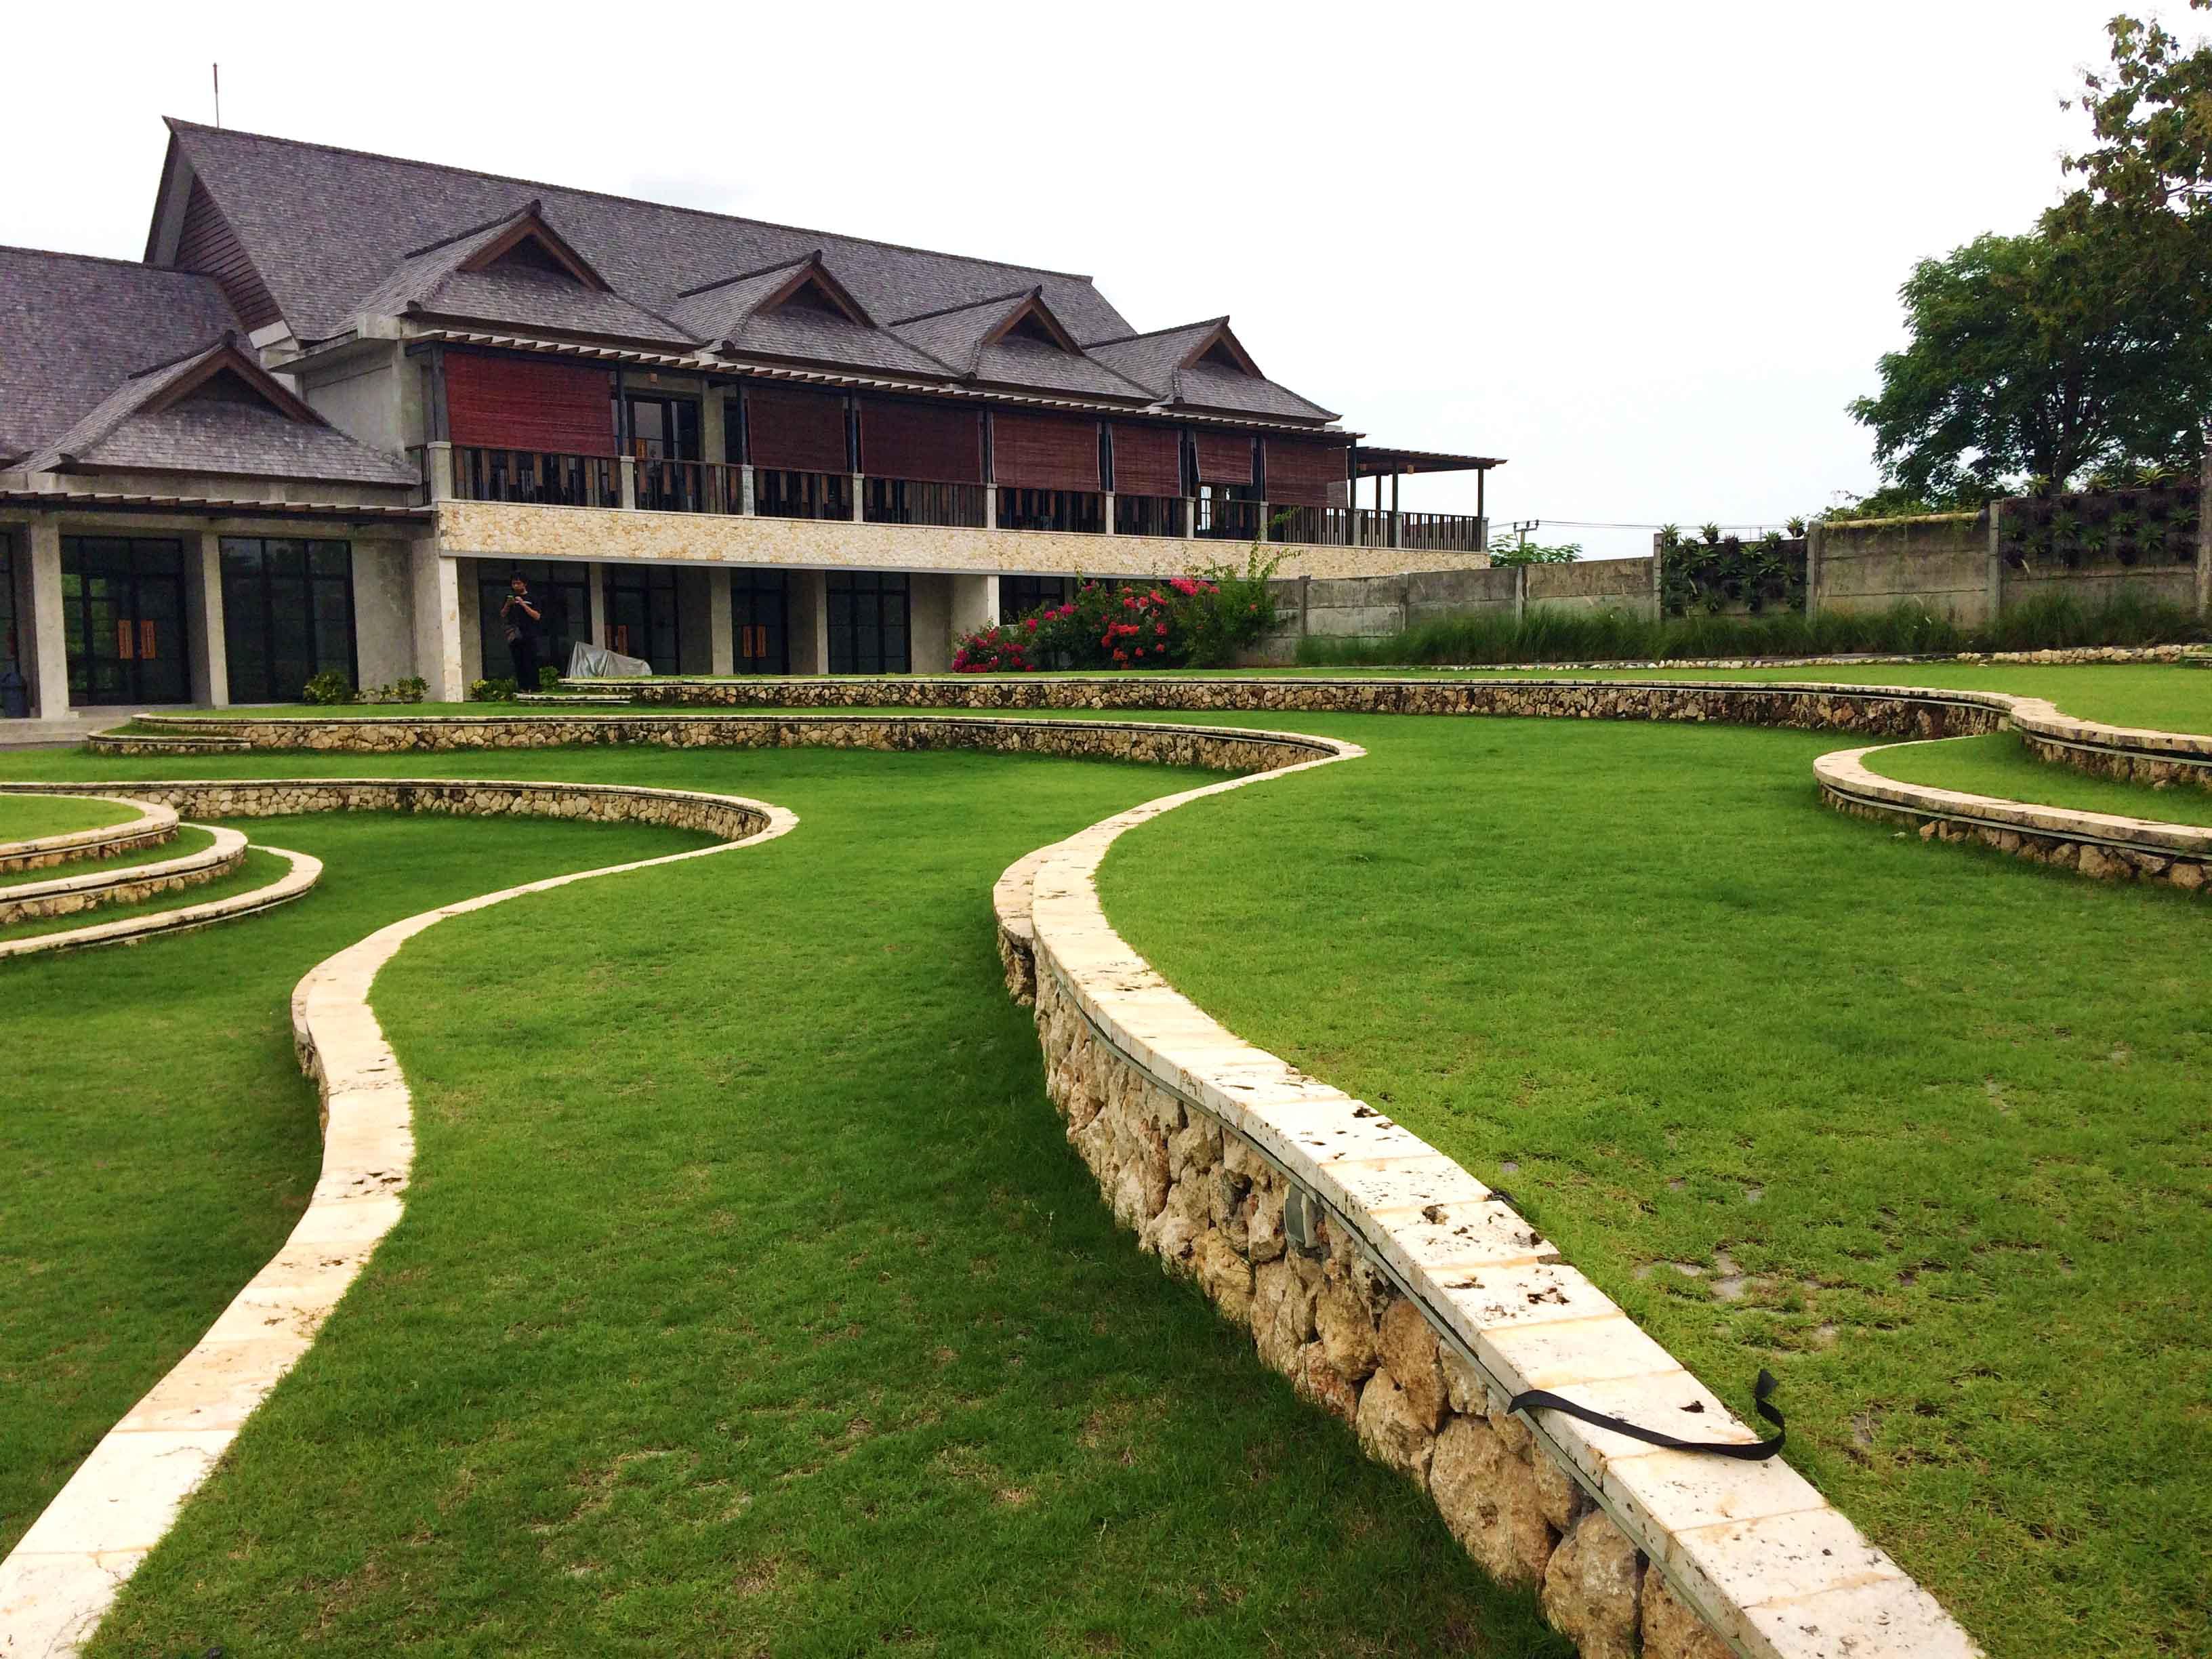 Monokroma Architect Jimbaran Hub Plaza Jimbaran, Kuta Sel., Kabupaten Badung, Bali, Indonesia Jimbaran, Kuta Sel., Kabupaten Badung, Bali, Indonesia Terracing Yard Tropis  38721